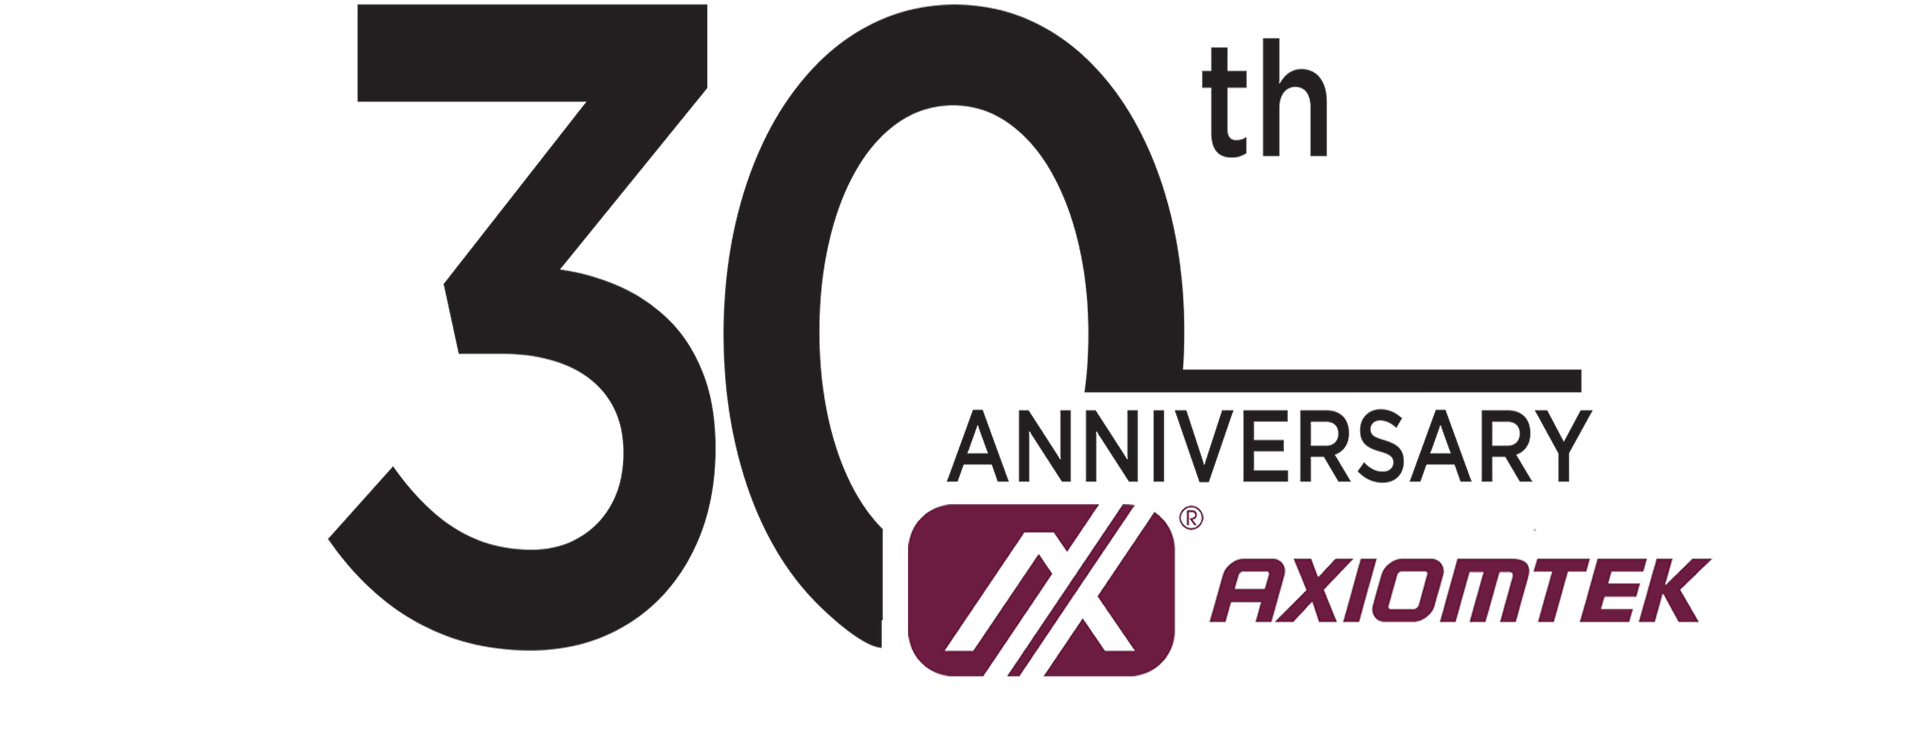 Axiomtek 30th Anniversary